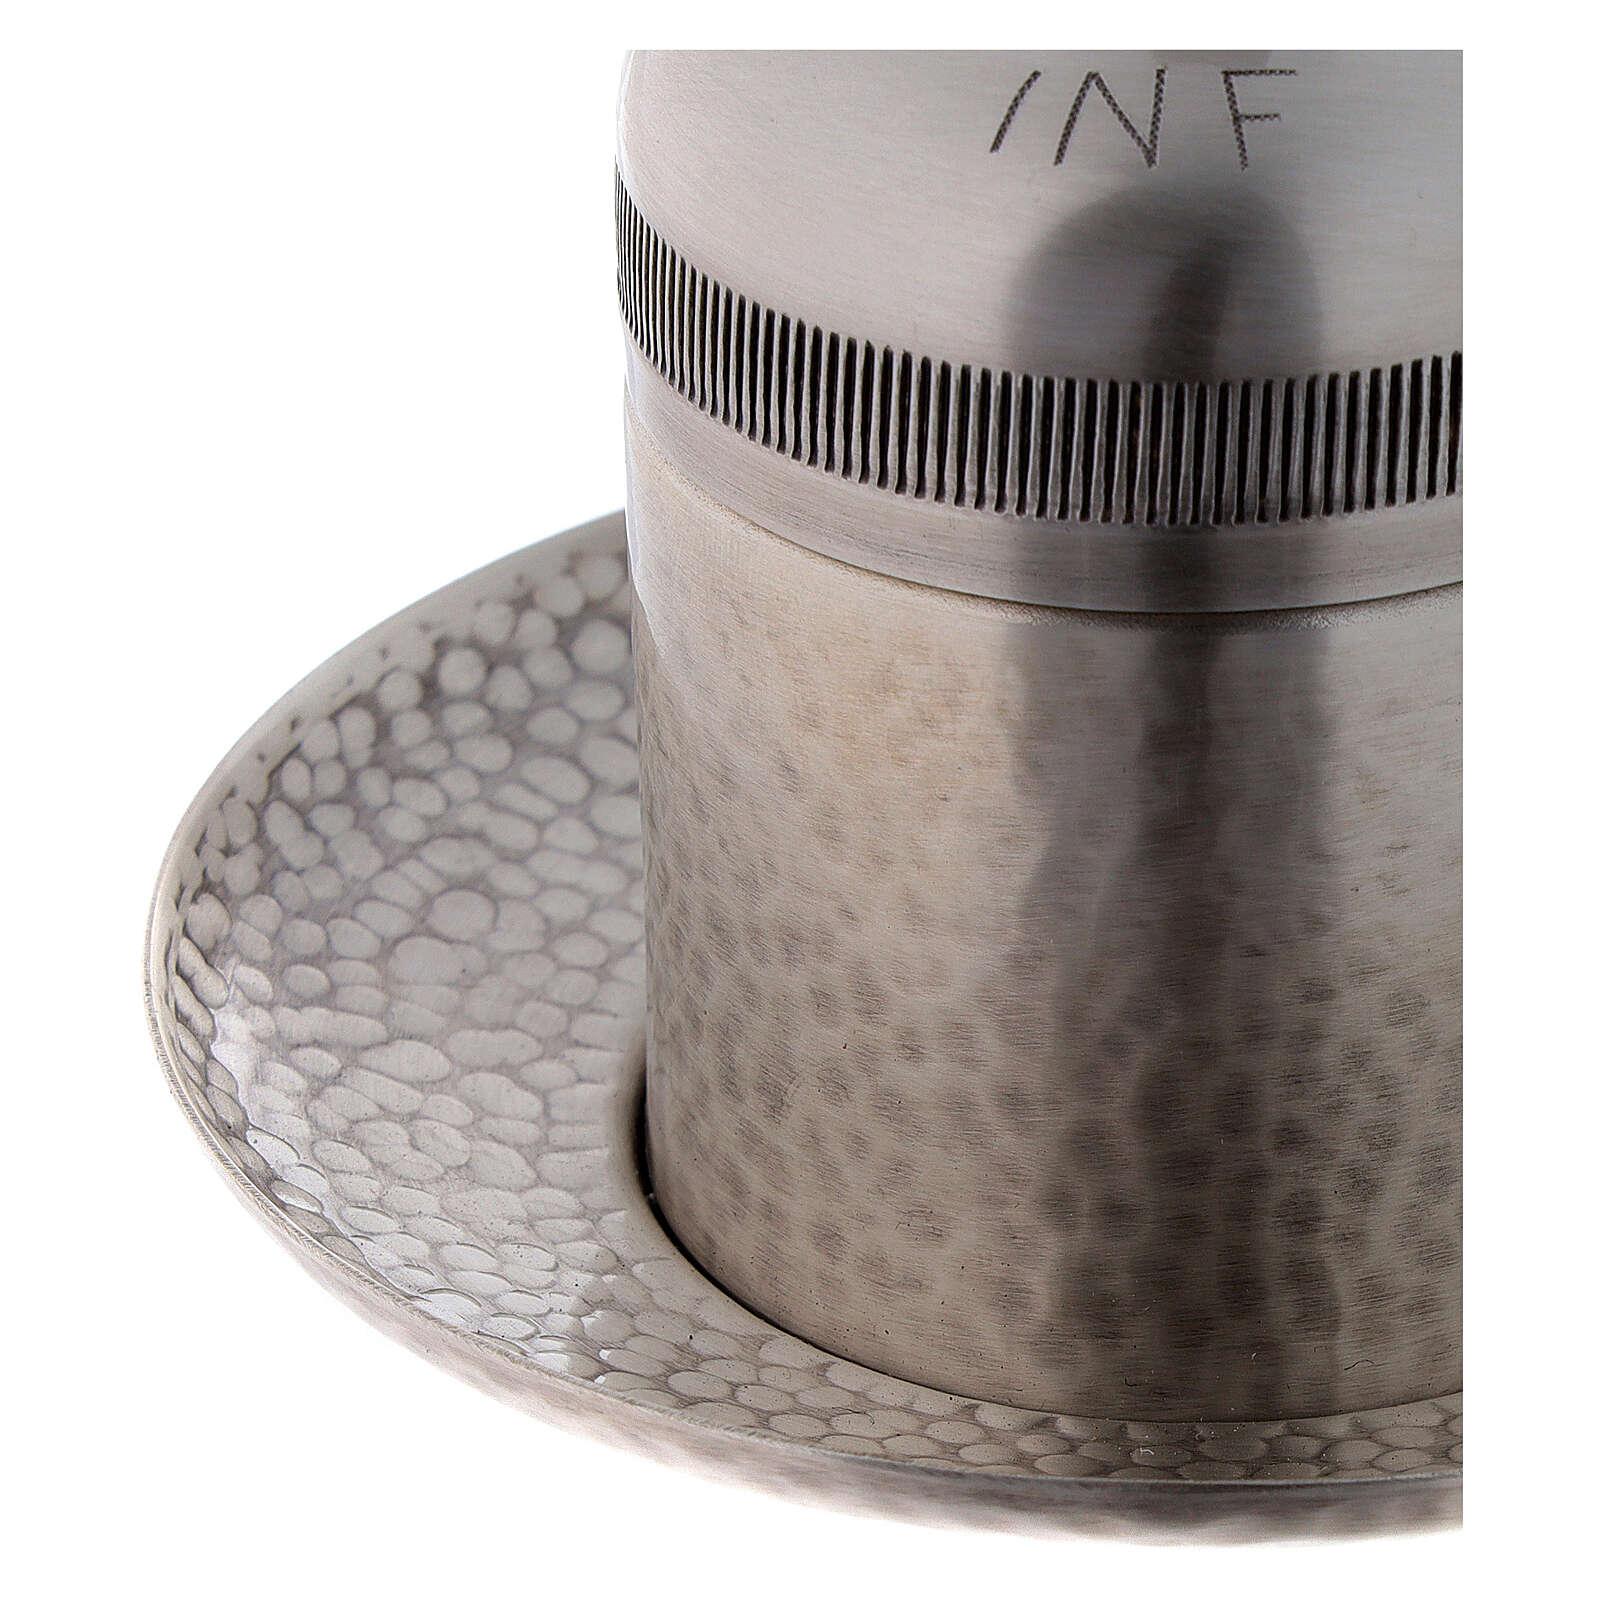 Vasetto ottone argentato olio infermi 50 ml 3